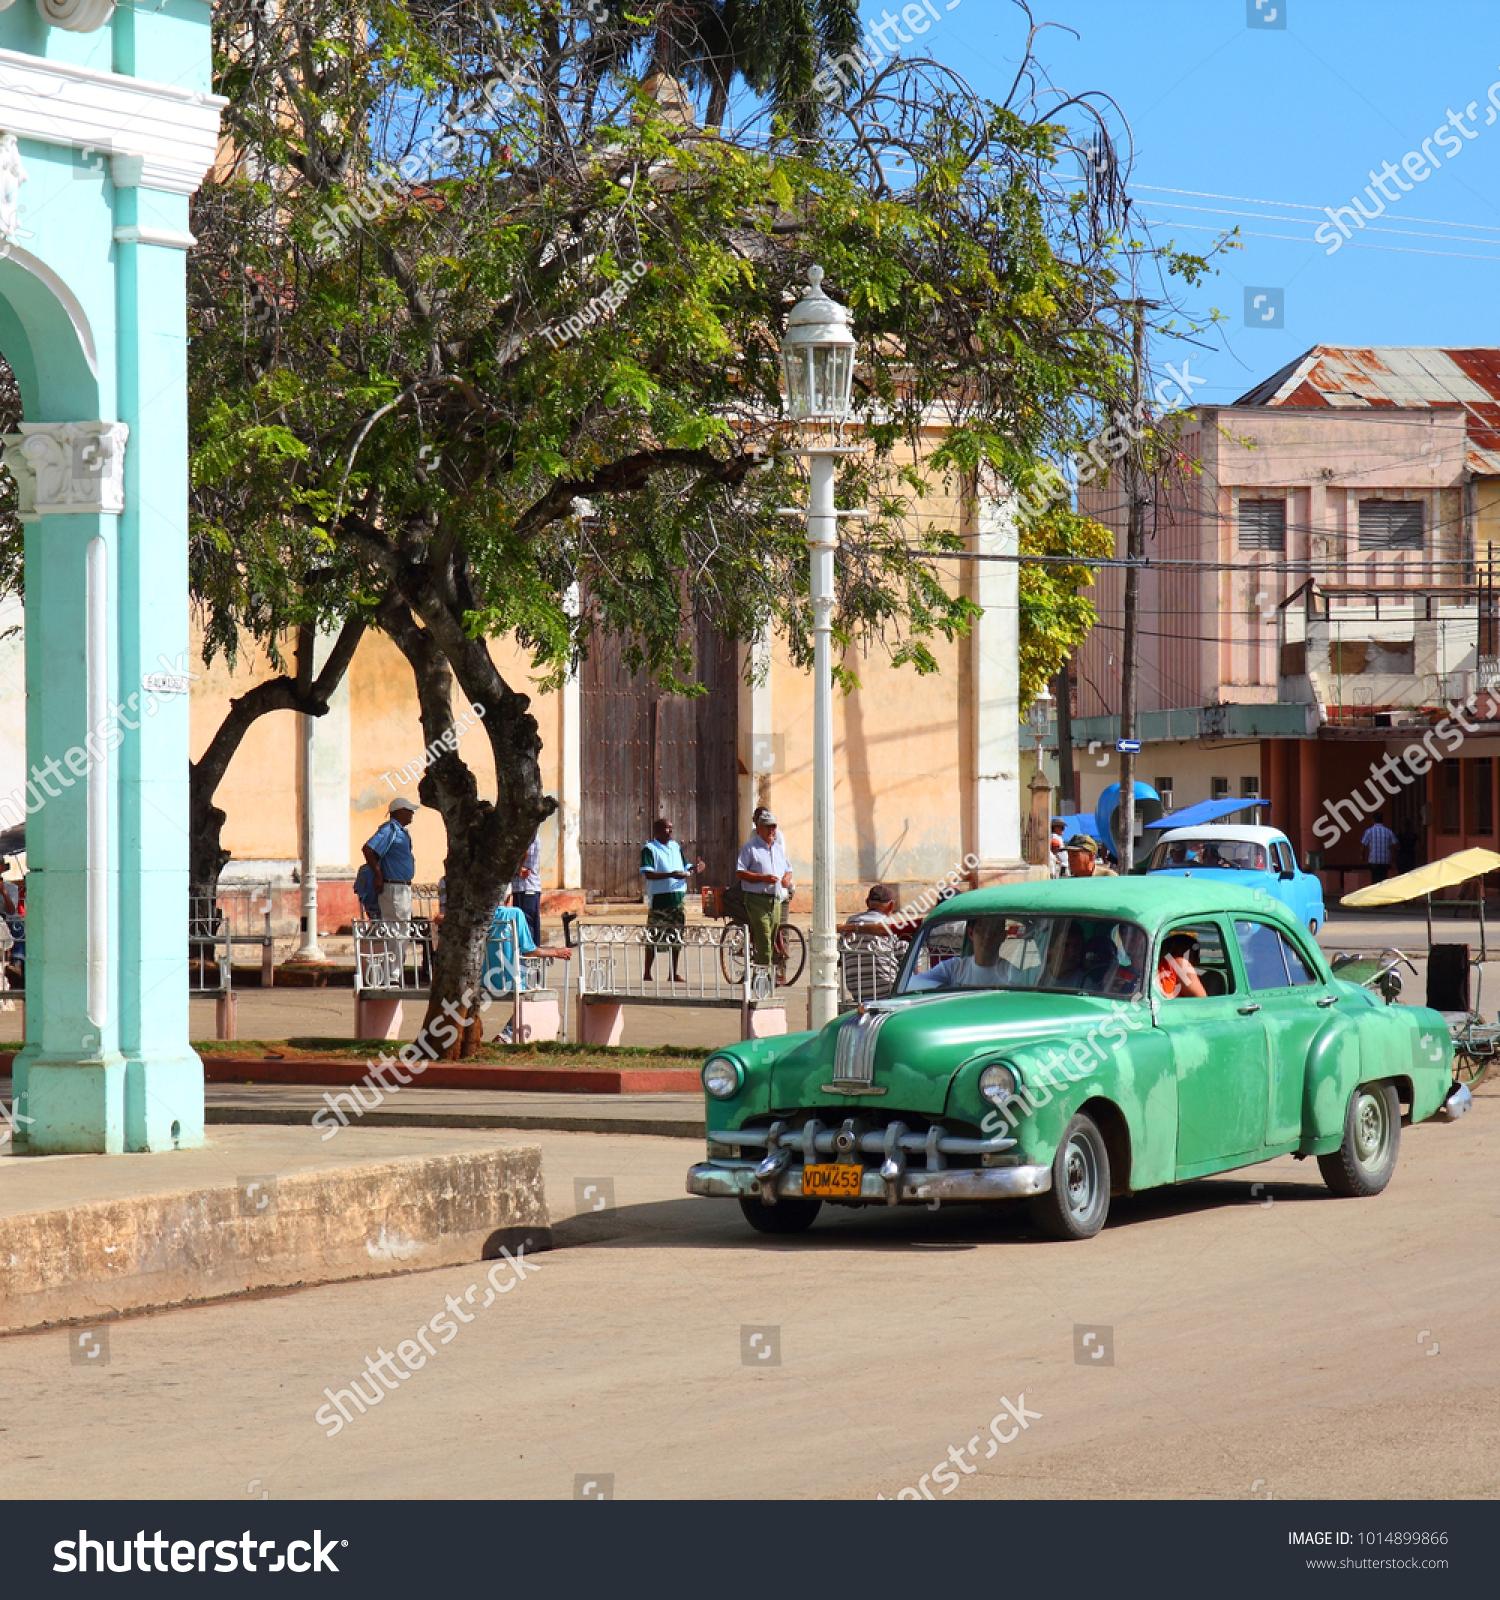 Remedios Cuba February 20 2011 Man Stock Photo 1014899866 - Shutterstock